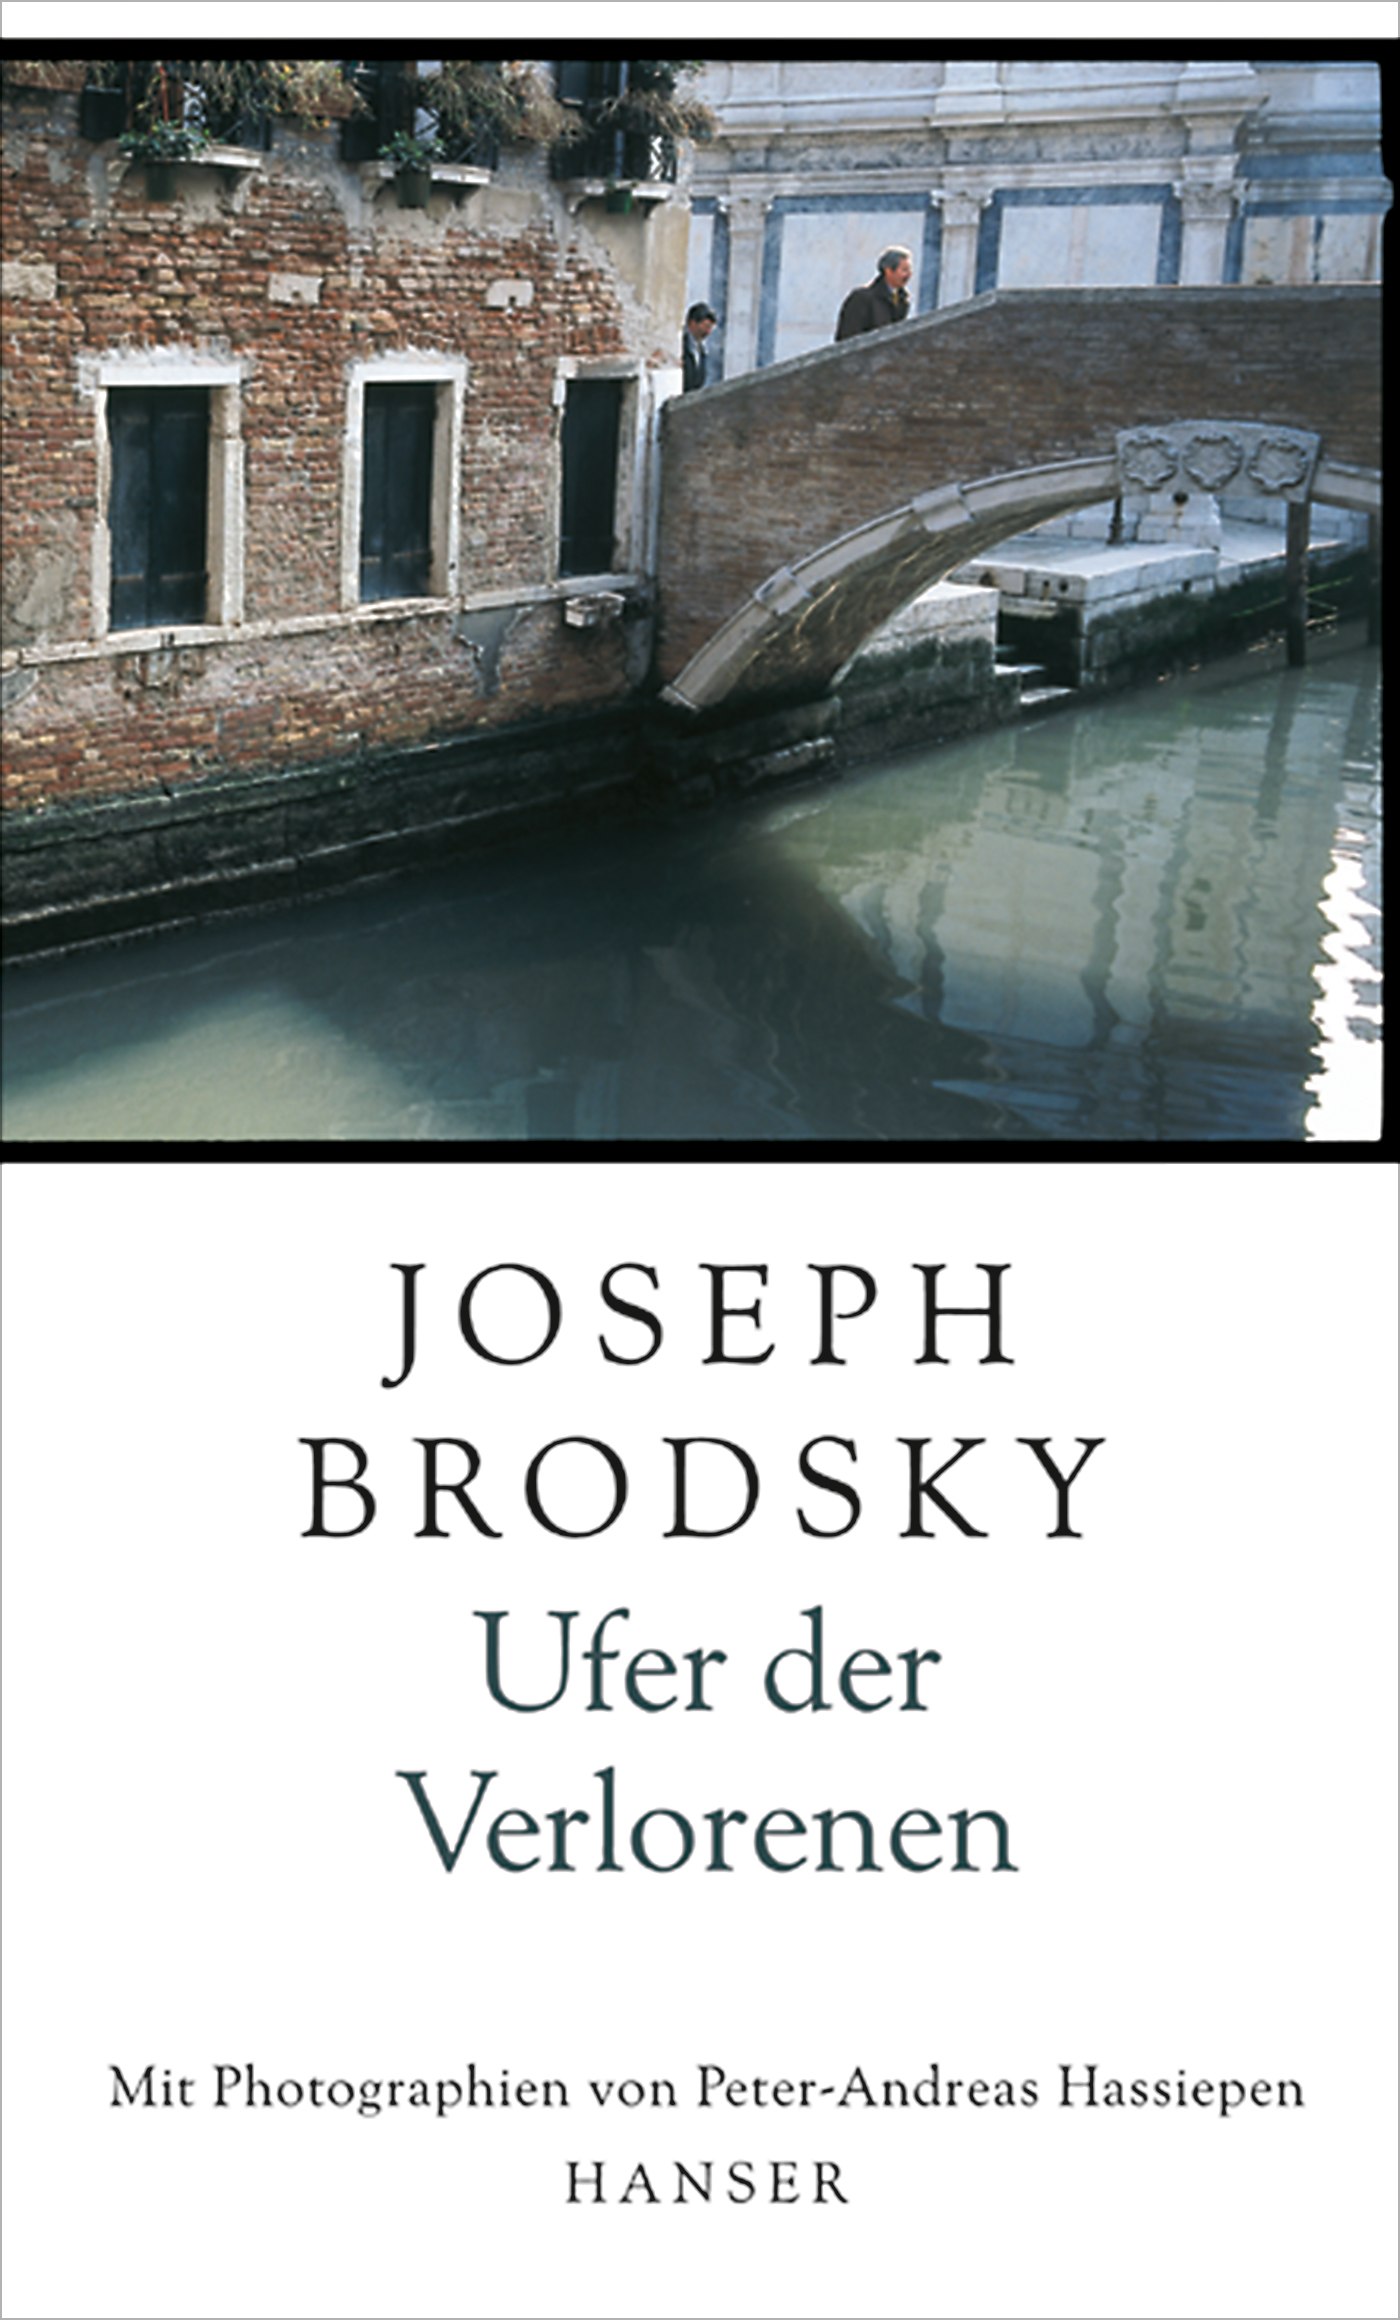 Ufer der Verlorenen - Joseph Brodsky